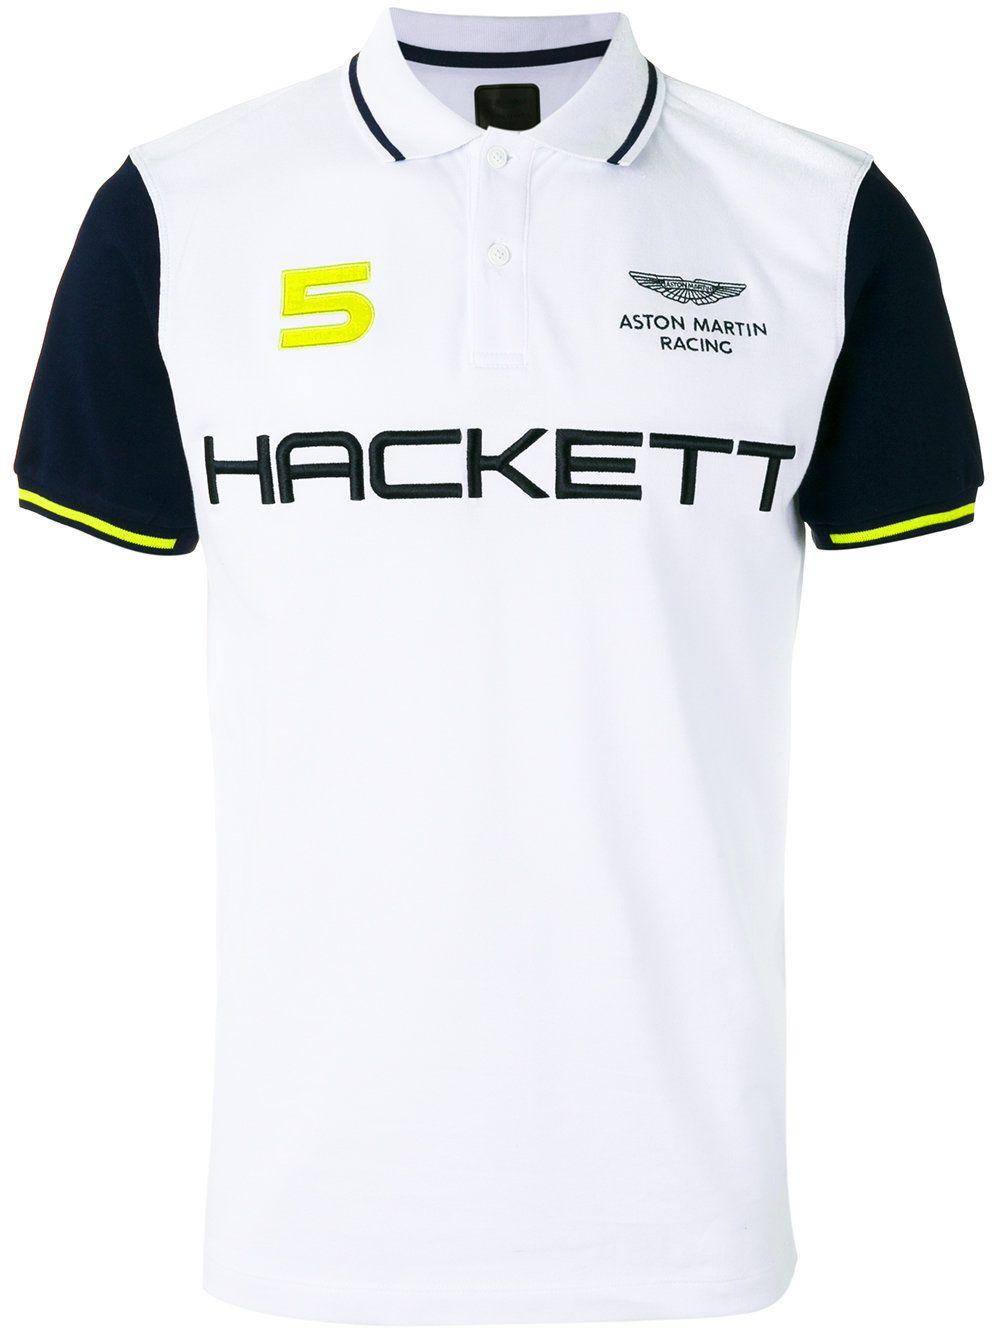 bec312d519 Hackett polo à logo imprimé | T-shirt sport | Smart casual polo ...